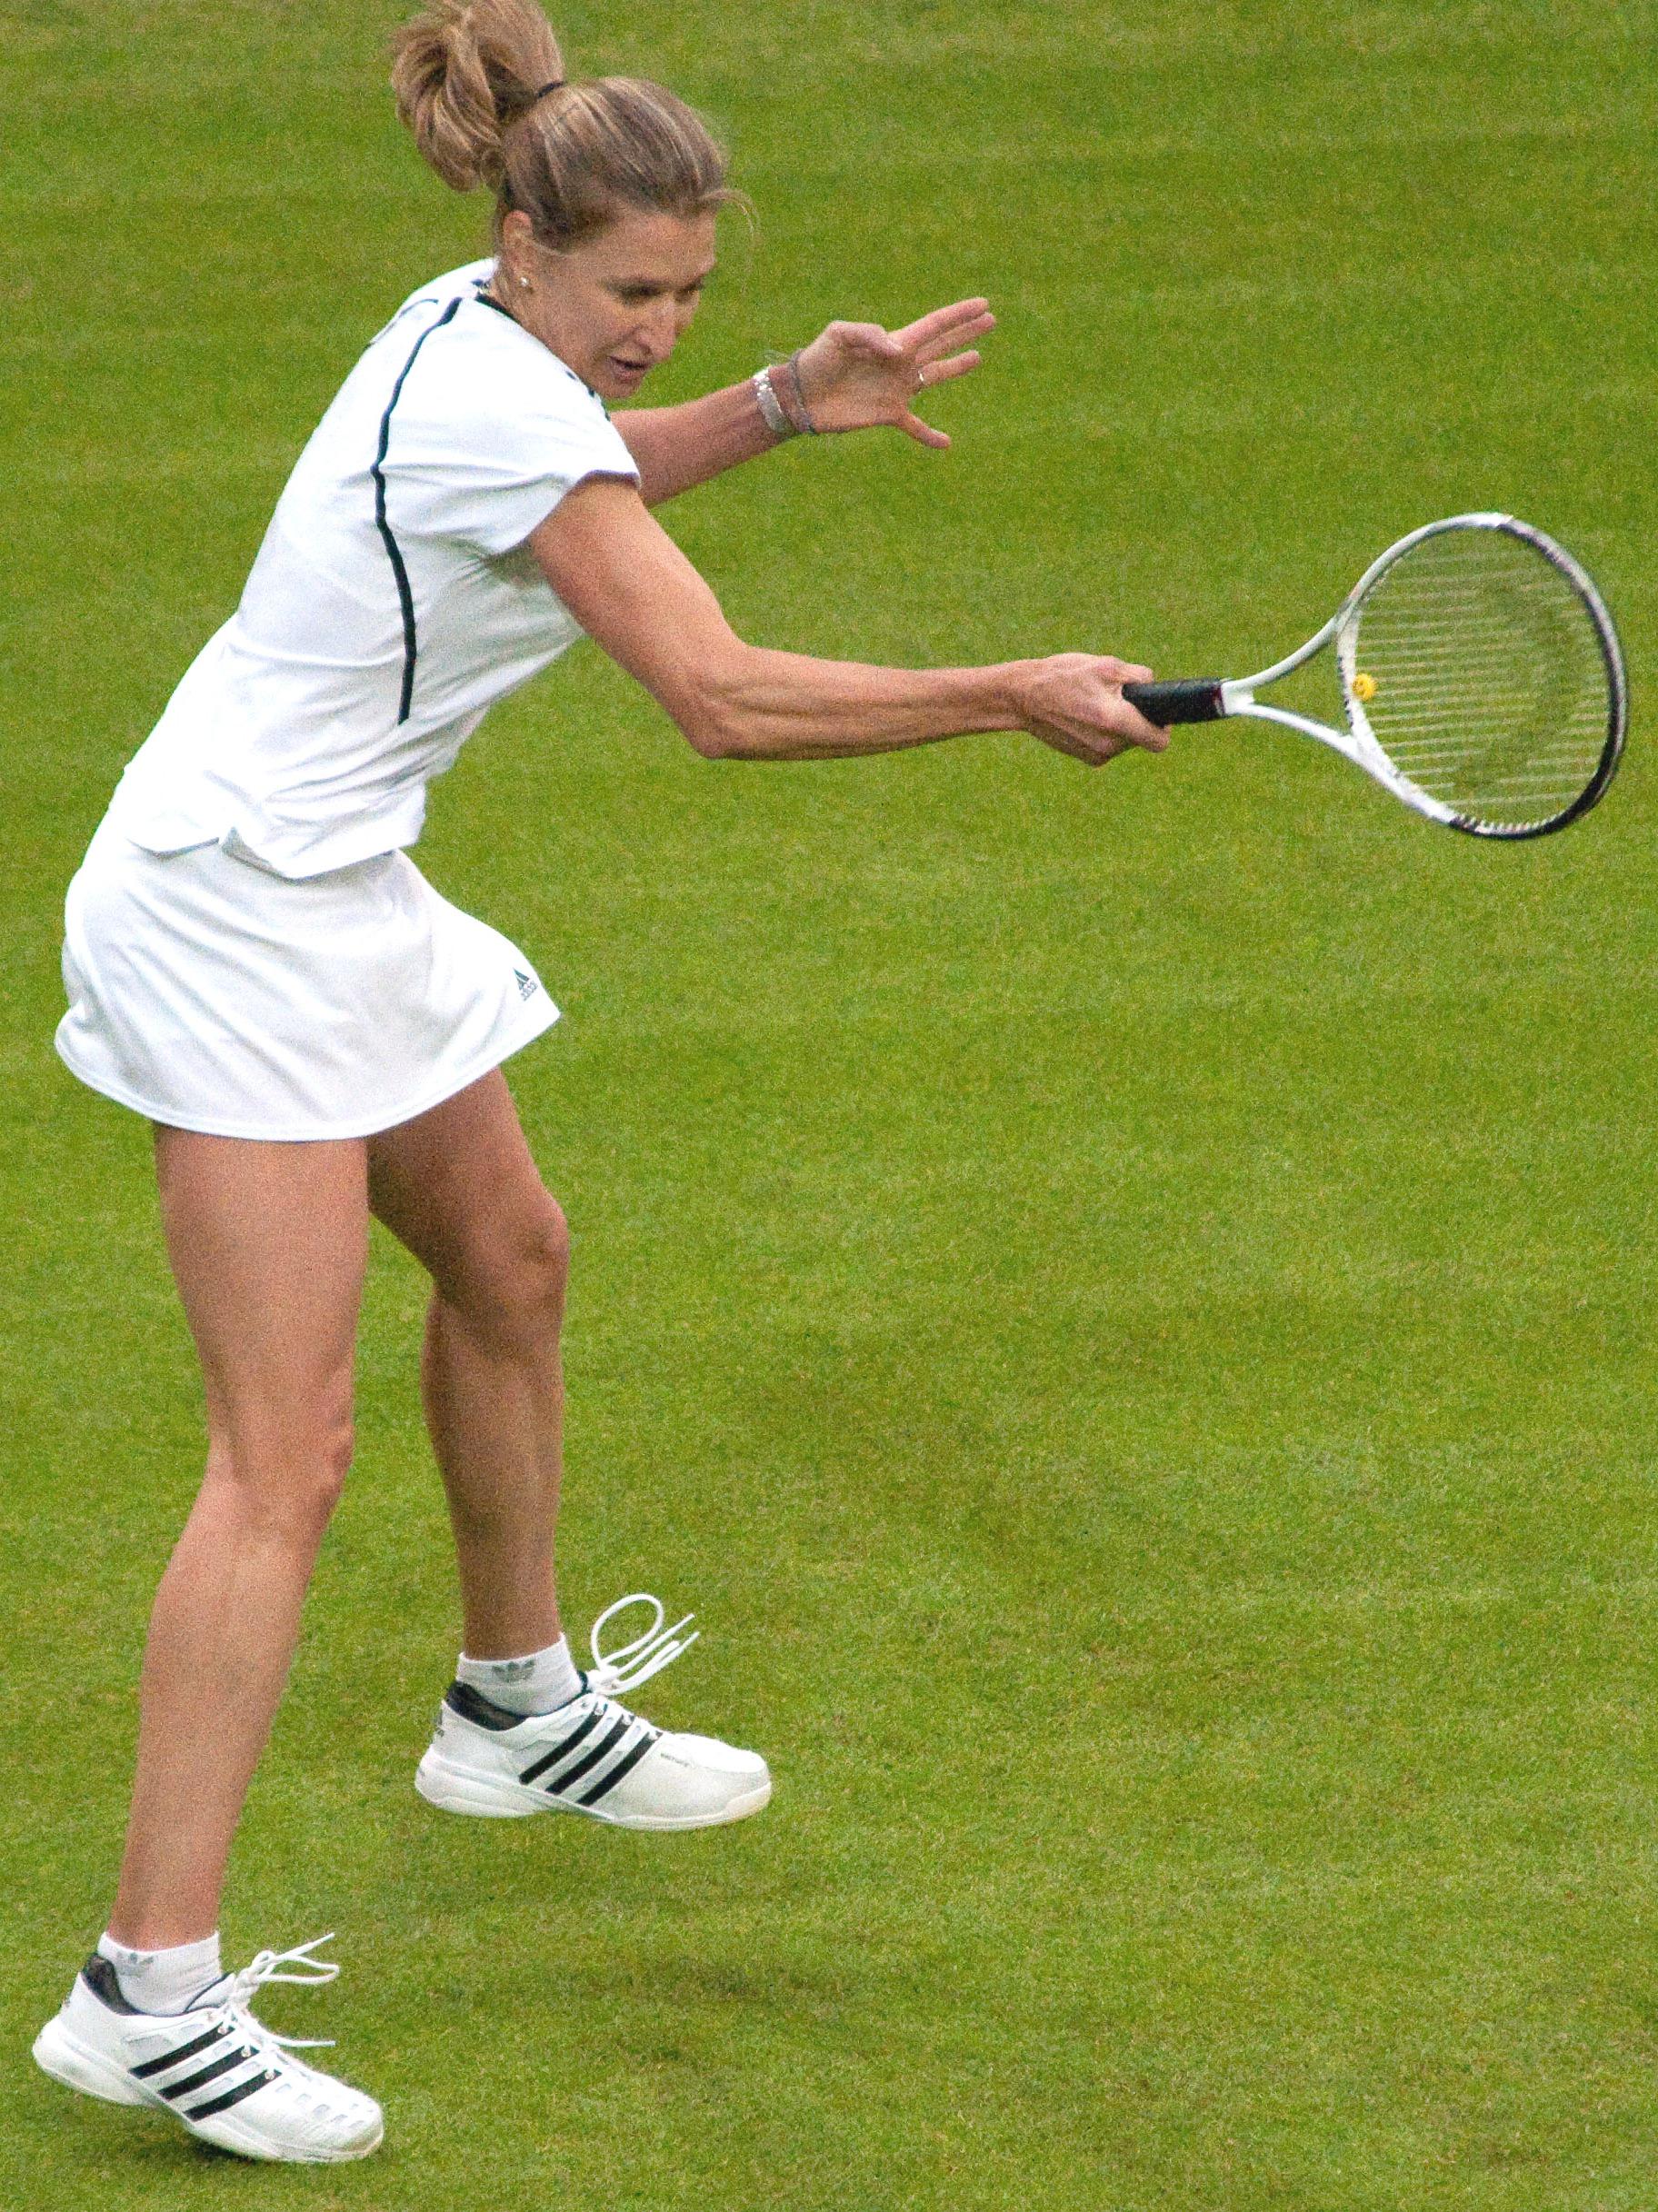 File Steffi Graf Wimbledon 2009 13 cropped Wikimedia mons